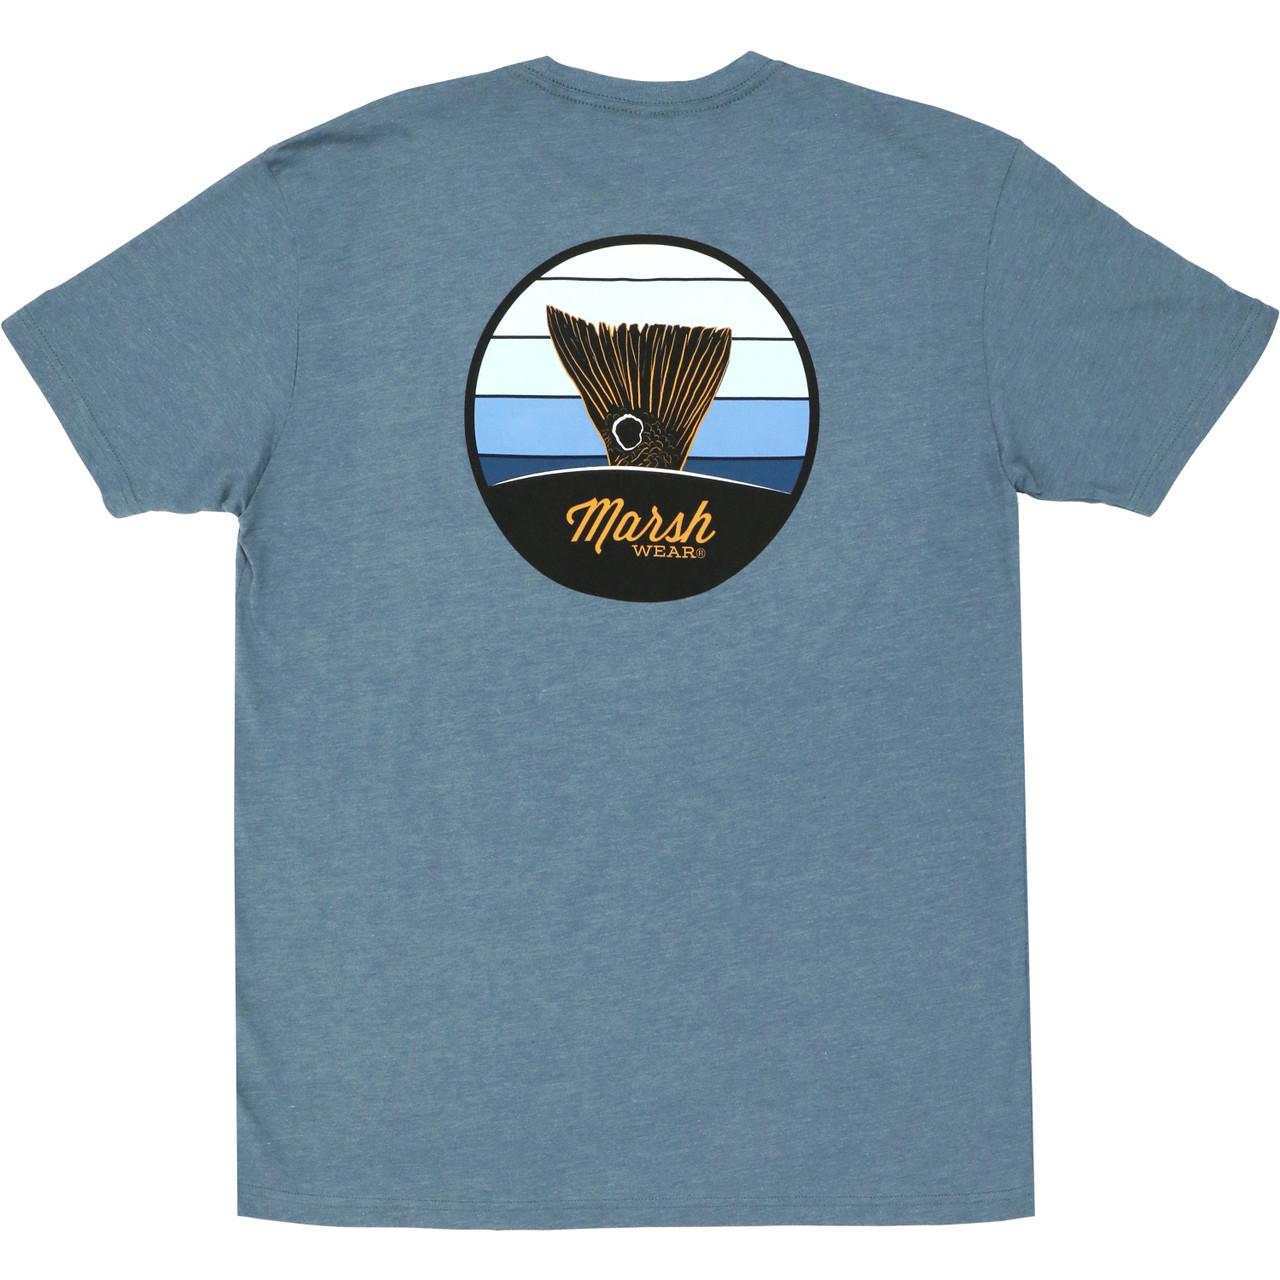 Marsh Wear MWT3046 Stripes T-Shirt Indigo Heather - Back